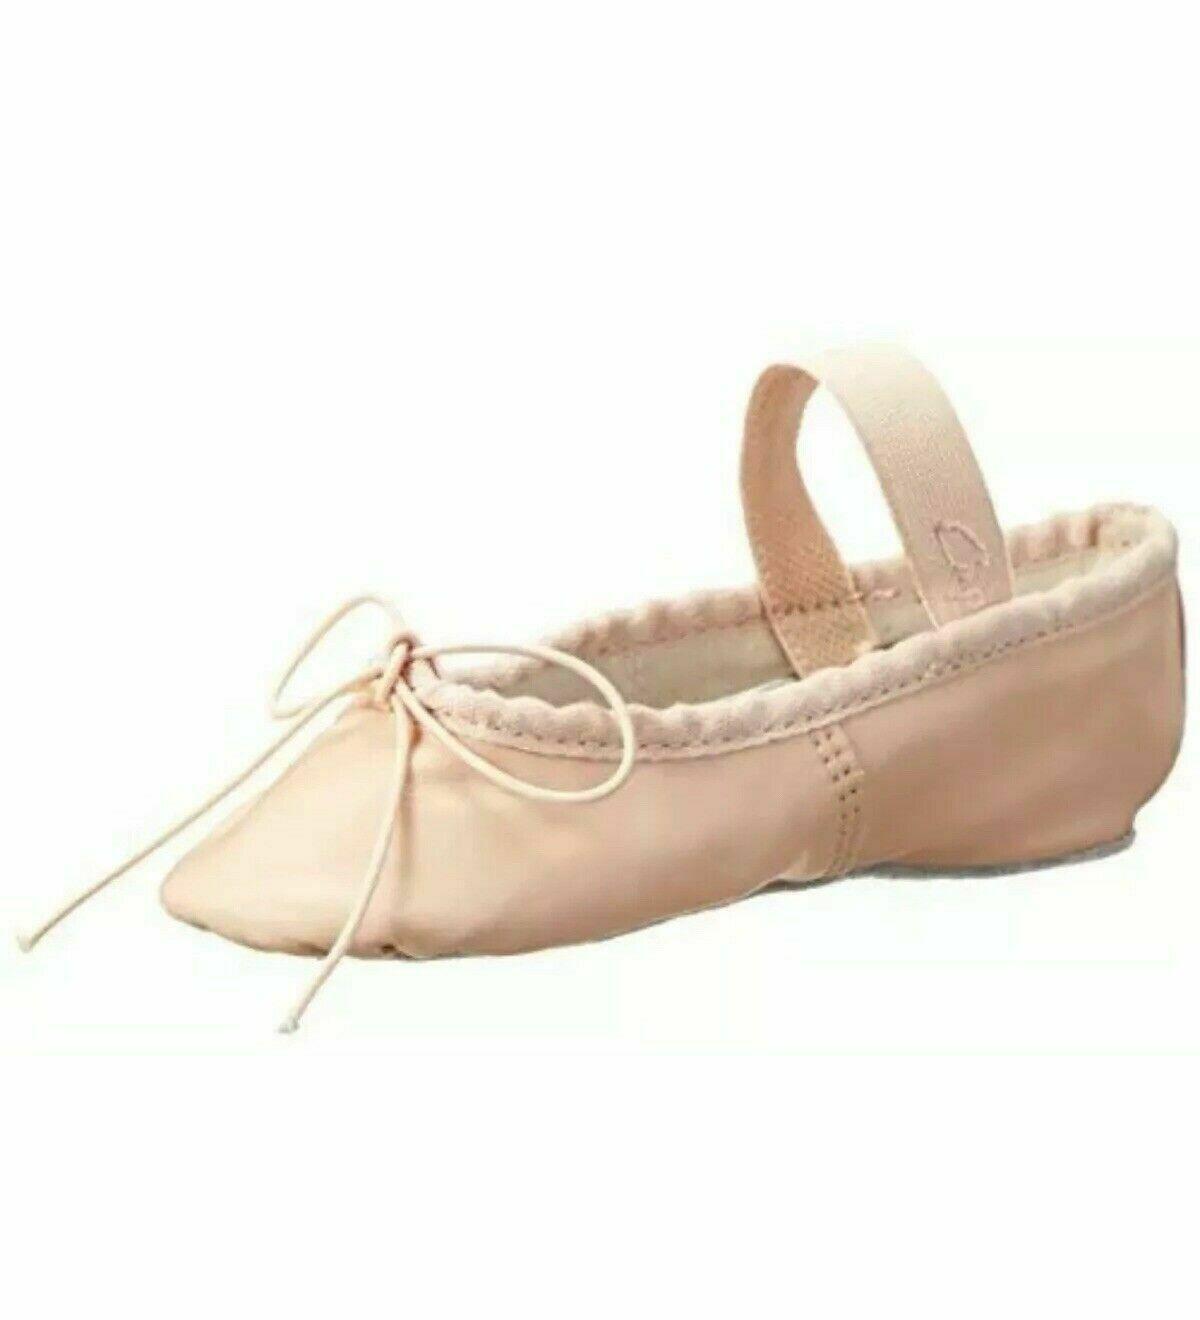 Capezio Adult Teknik 200 NPK Pink Full Sole Ballet Shoe Size 4.5B 4.5 B